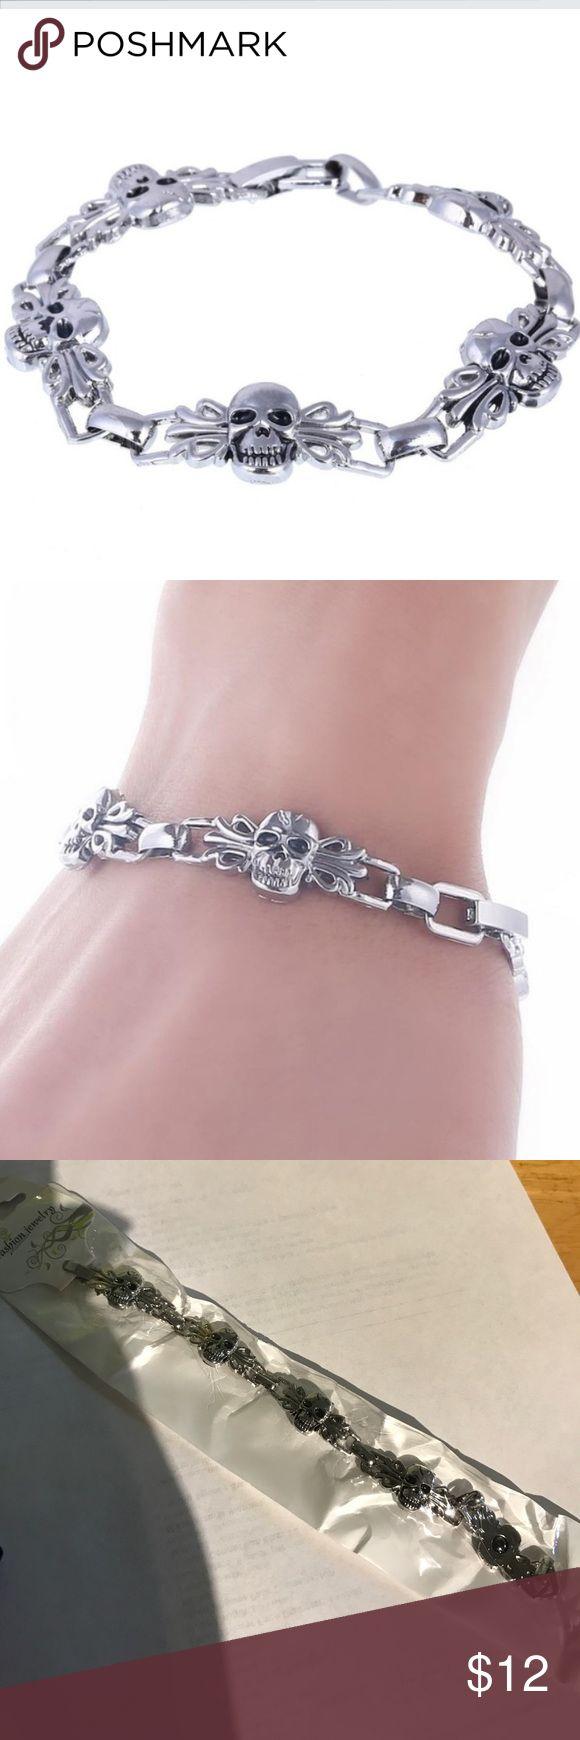 Skull bracelet Vintage stainless steel skull bracelet for punk jewelry men's charm bracelet Accessories Jewelry